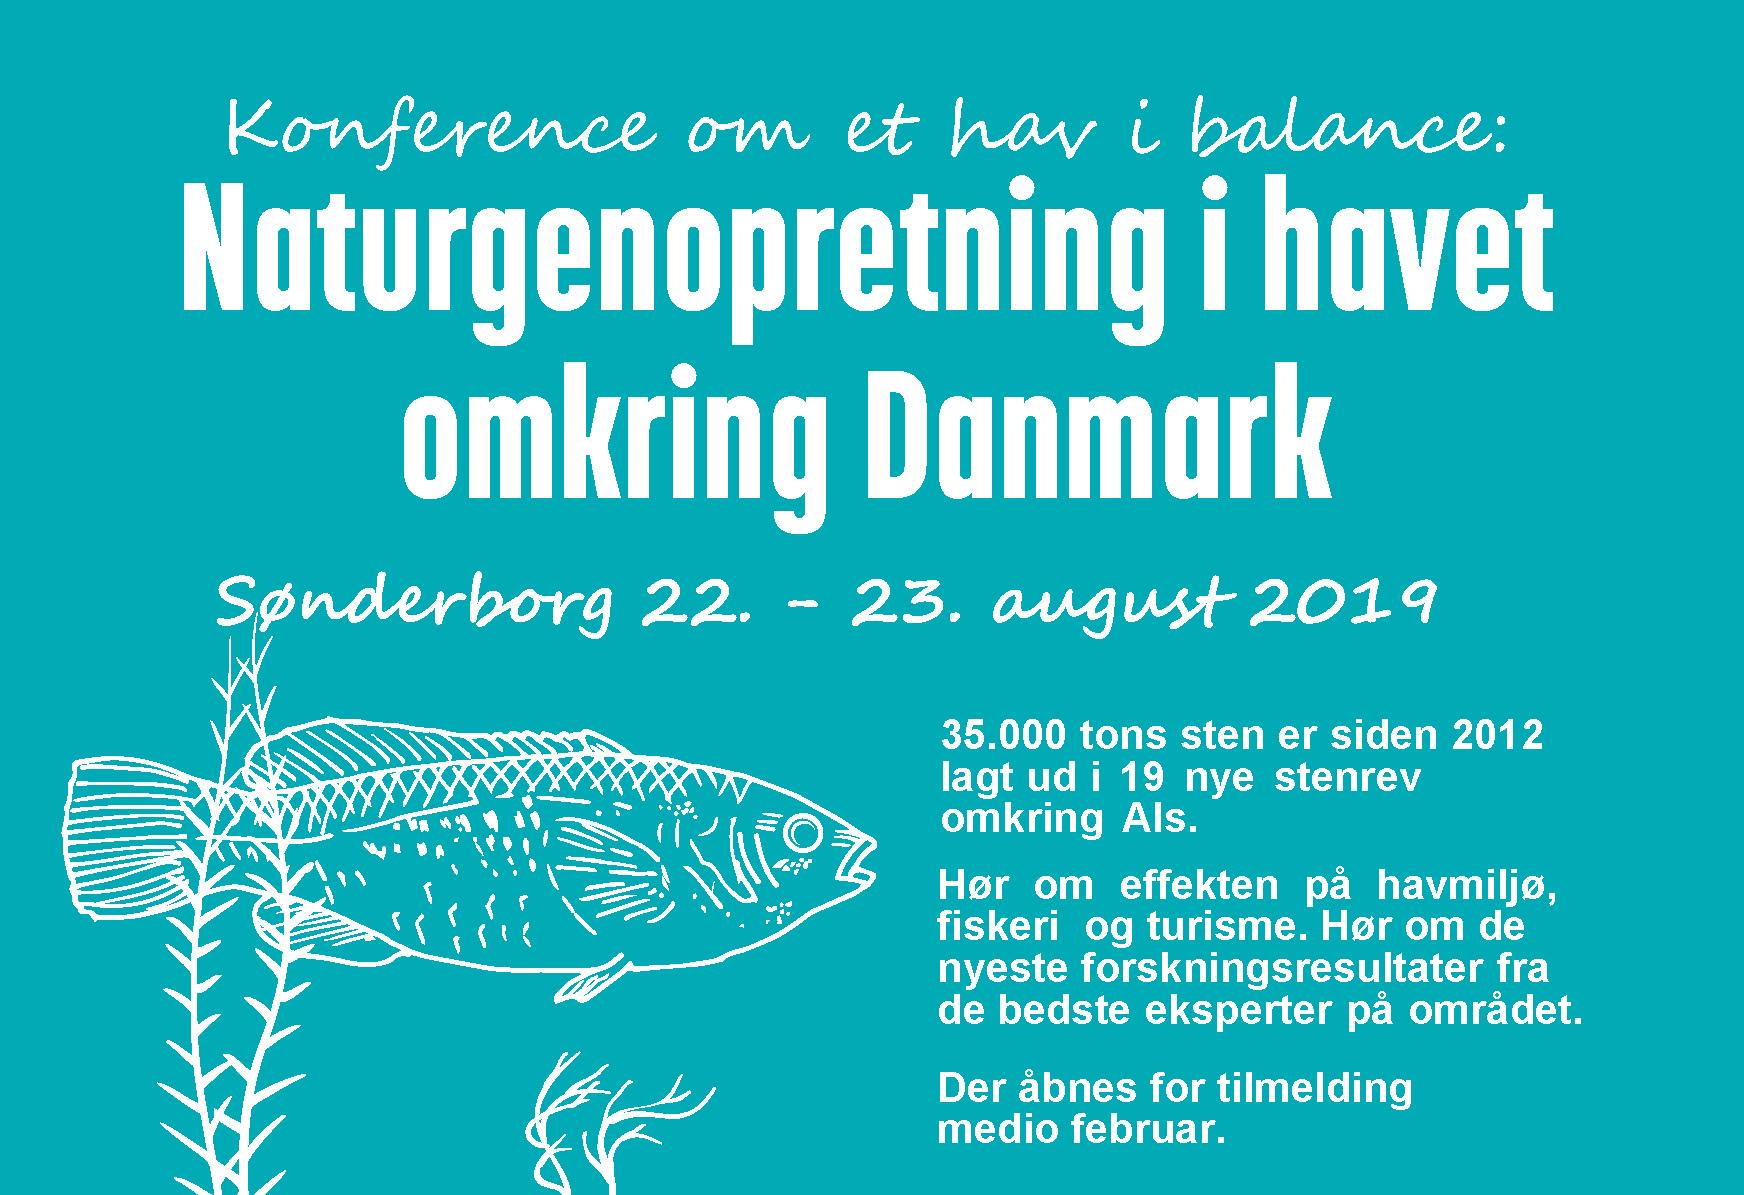 Stenrev Konference Sønderborg